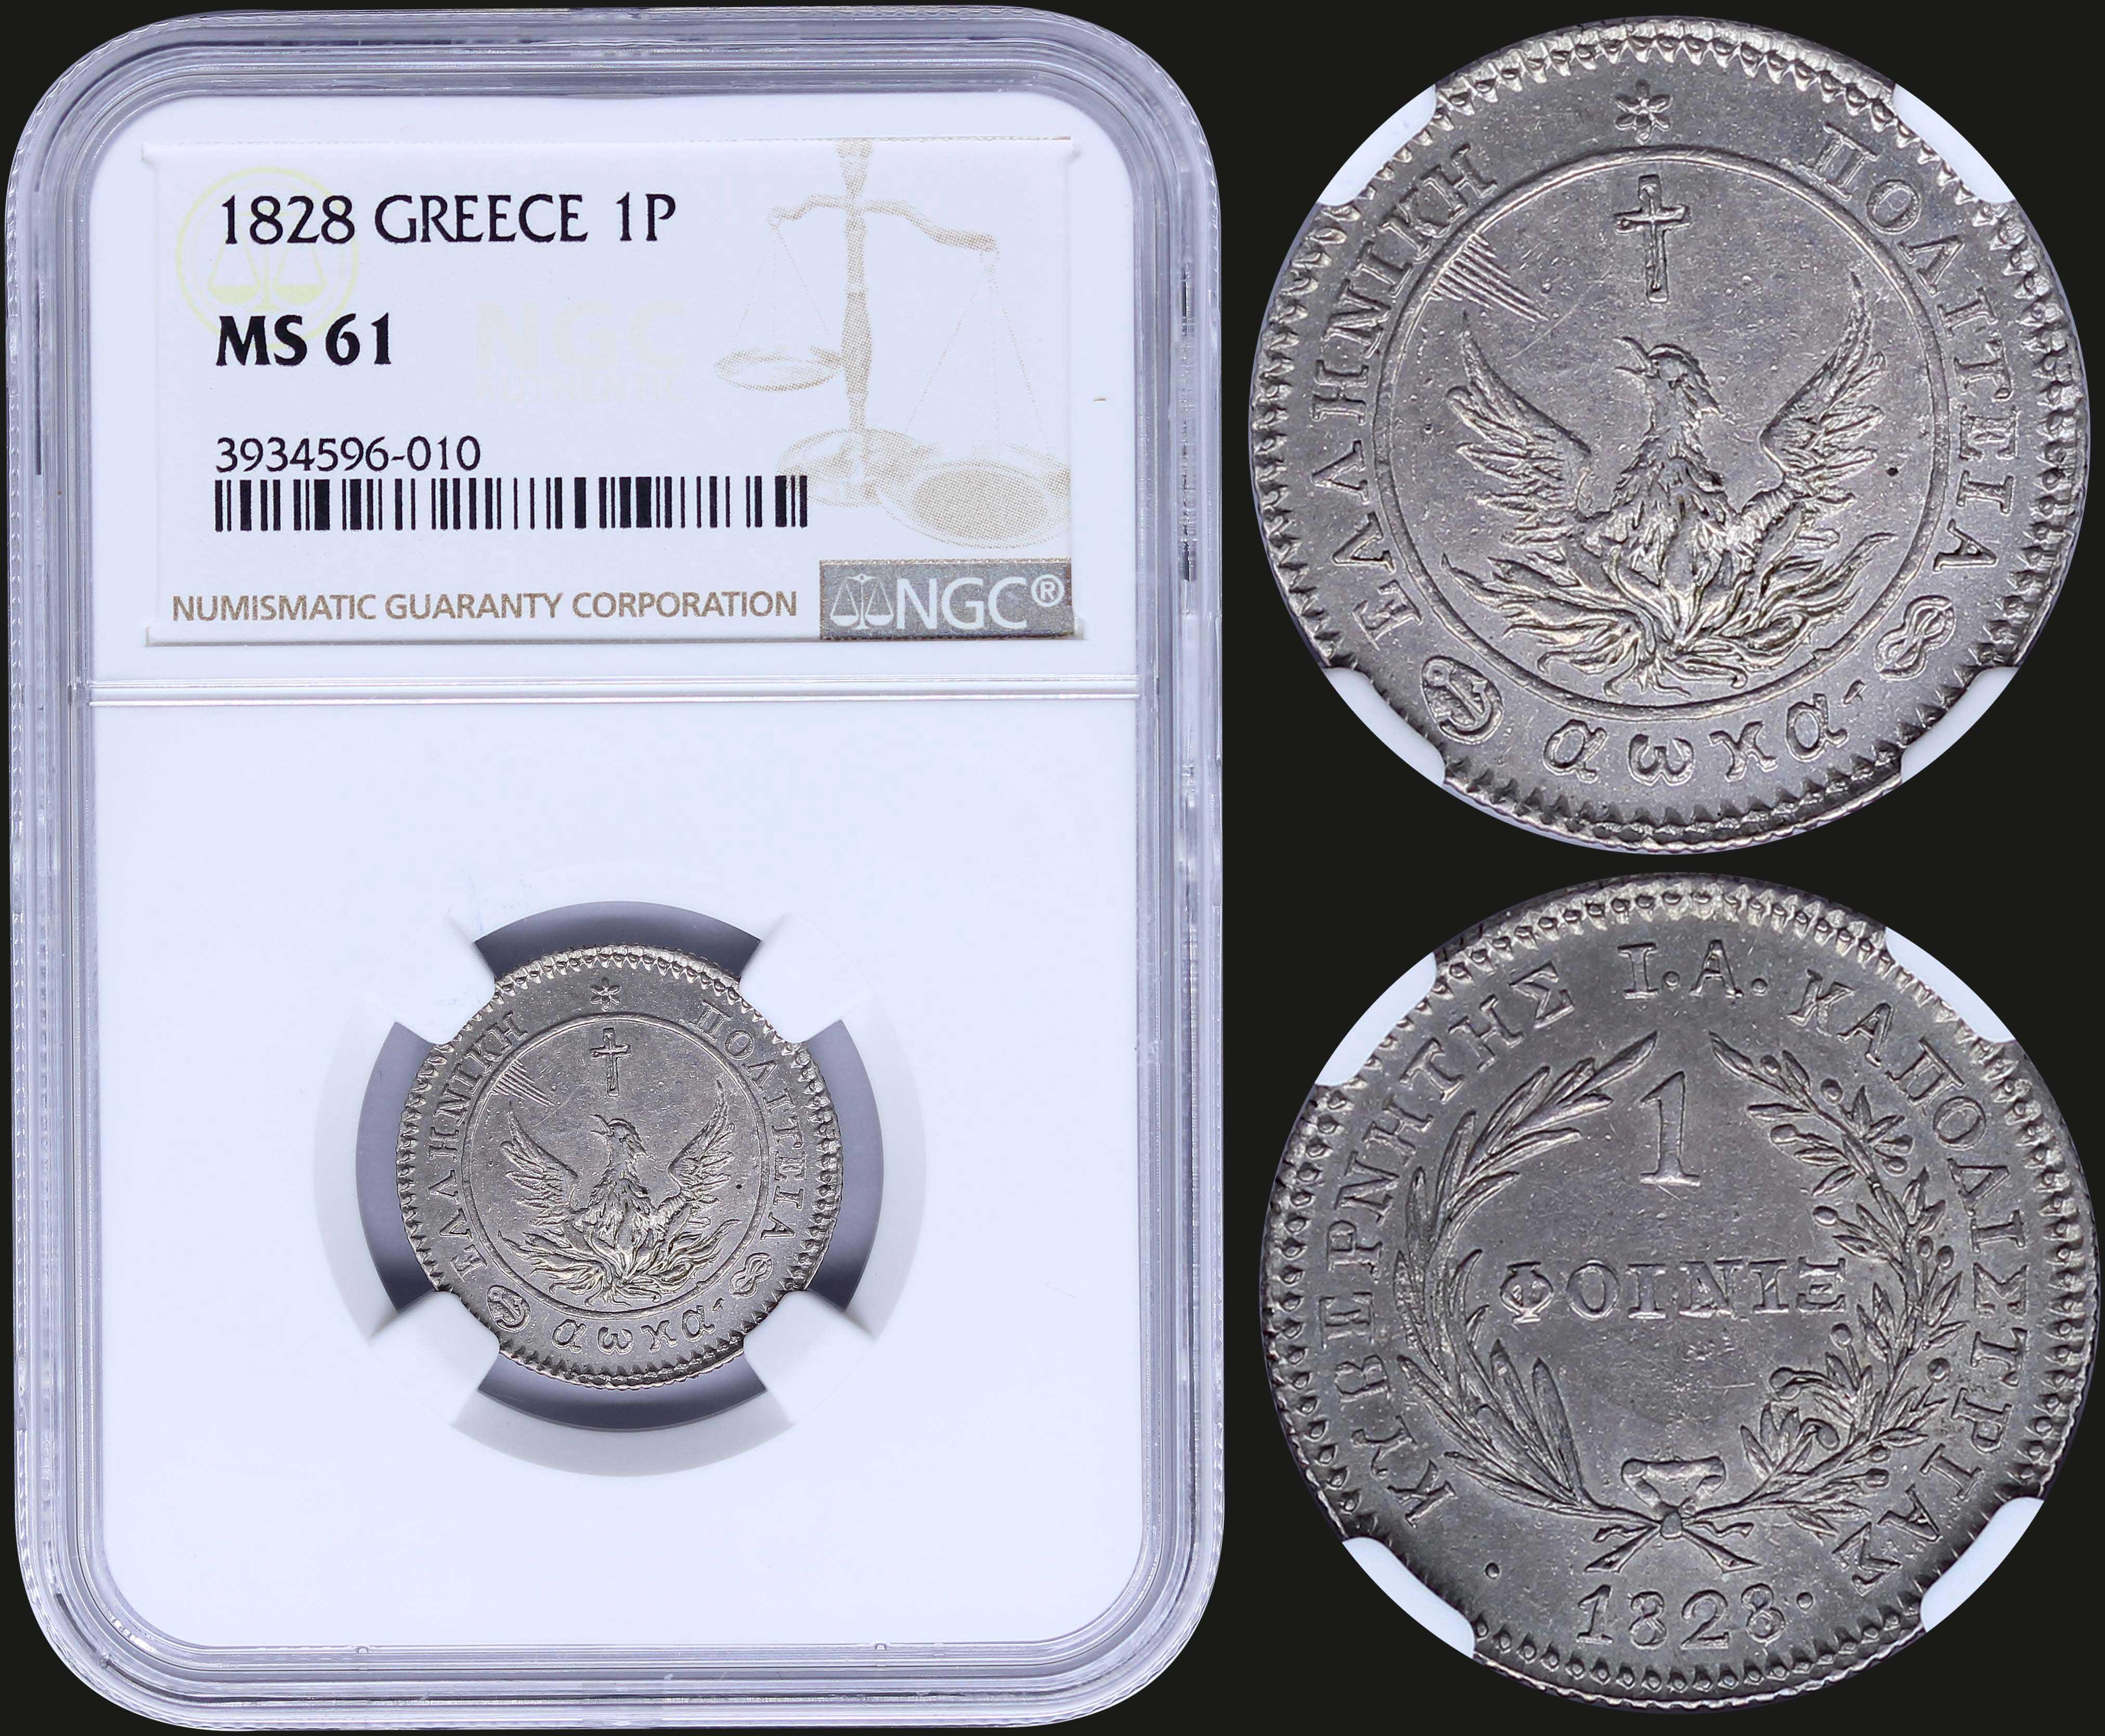 Lot 3015 - GREECE-  COINS & TOKENS governor capodistrias -  A. Karamitsos Public & LIVE Bid Auction 631 Coins, Medals & Banknotes